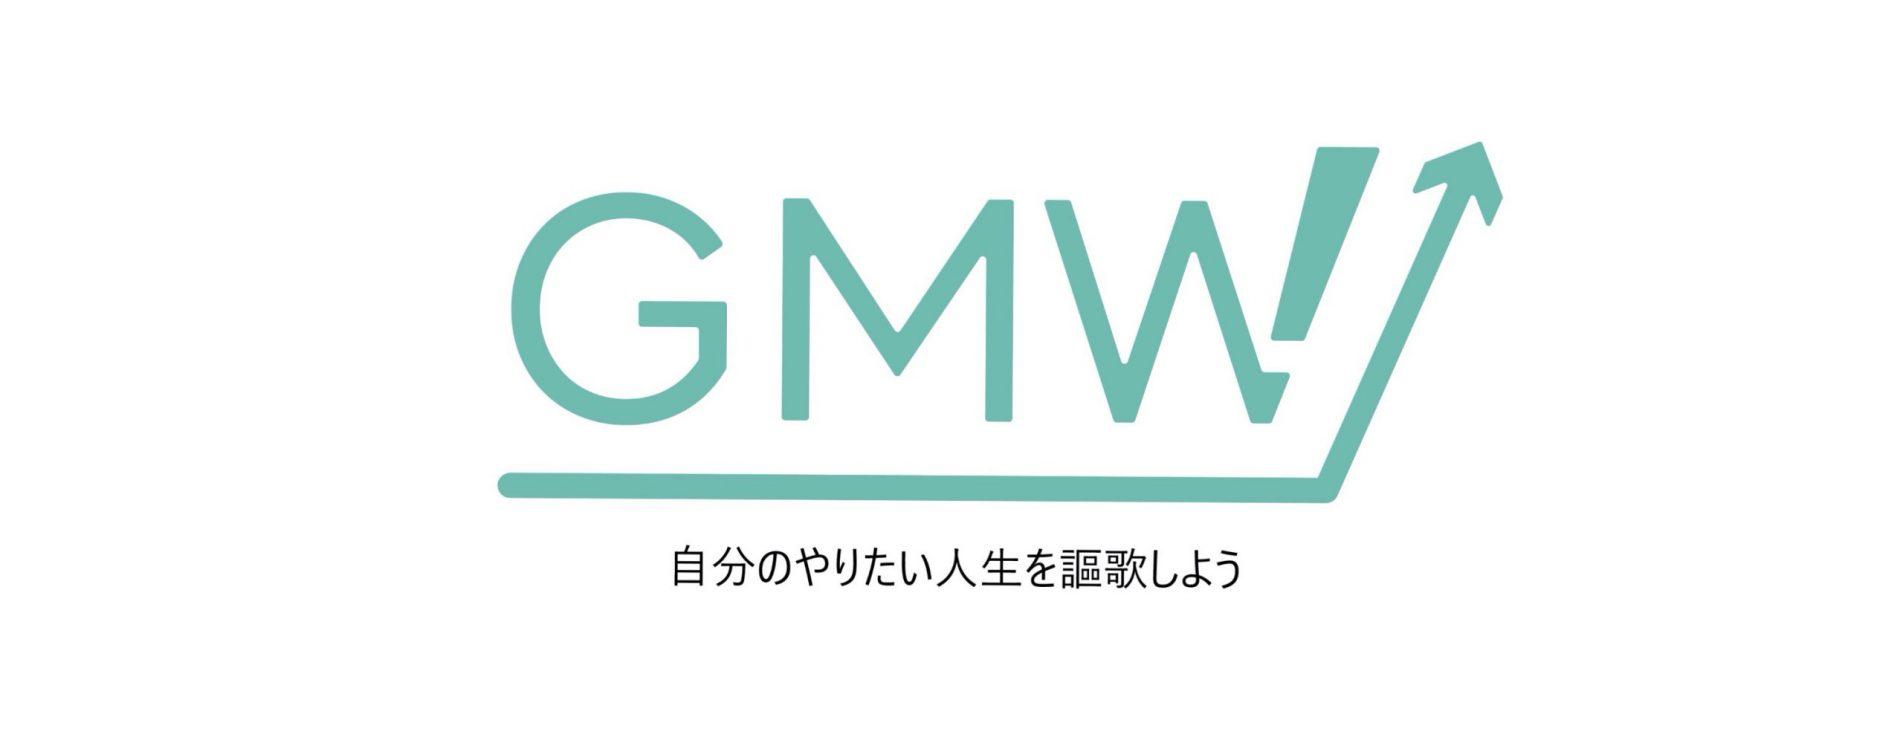 株式会社GMW